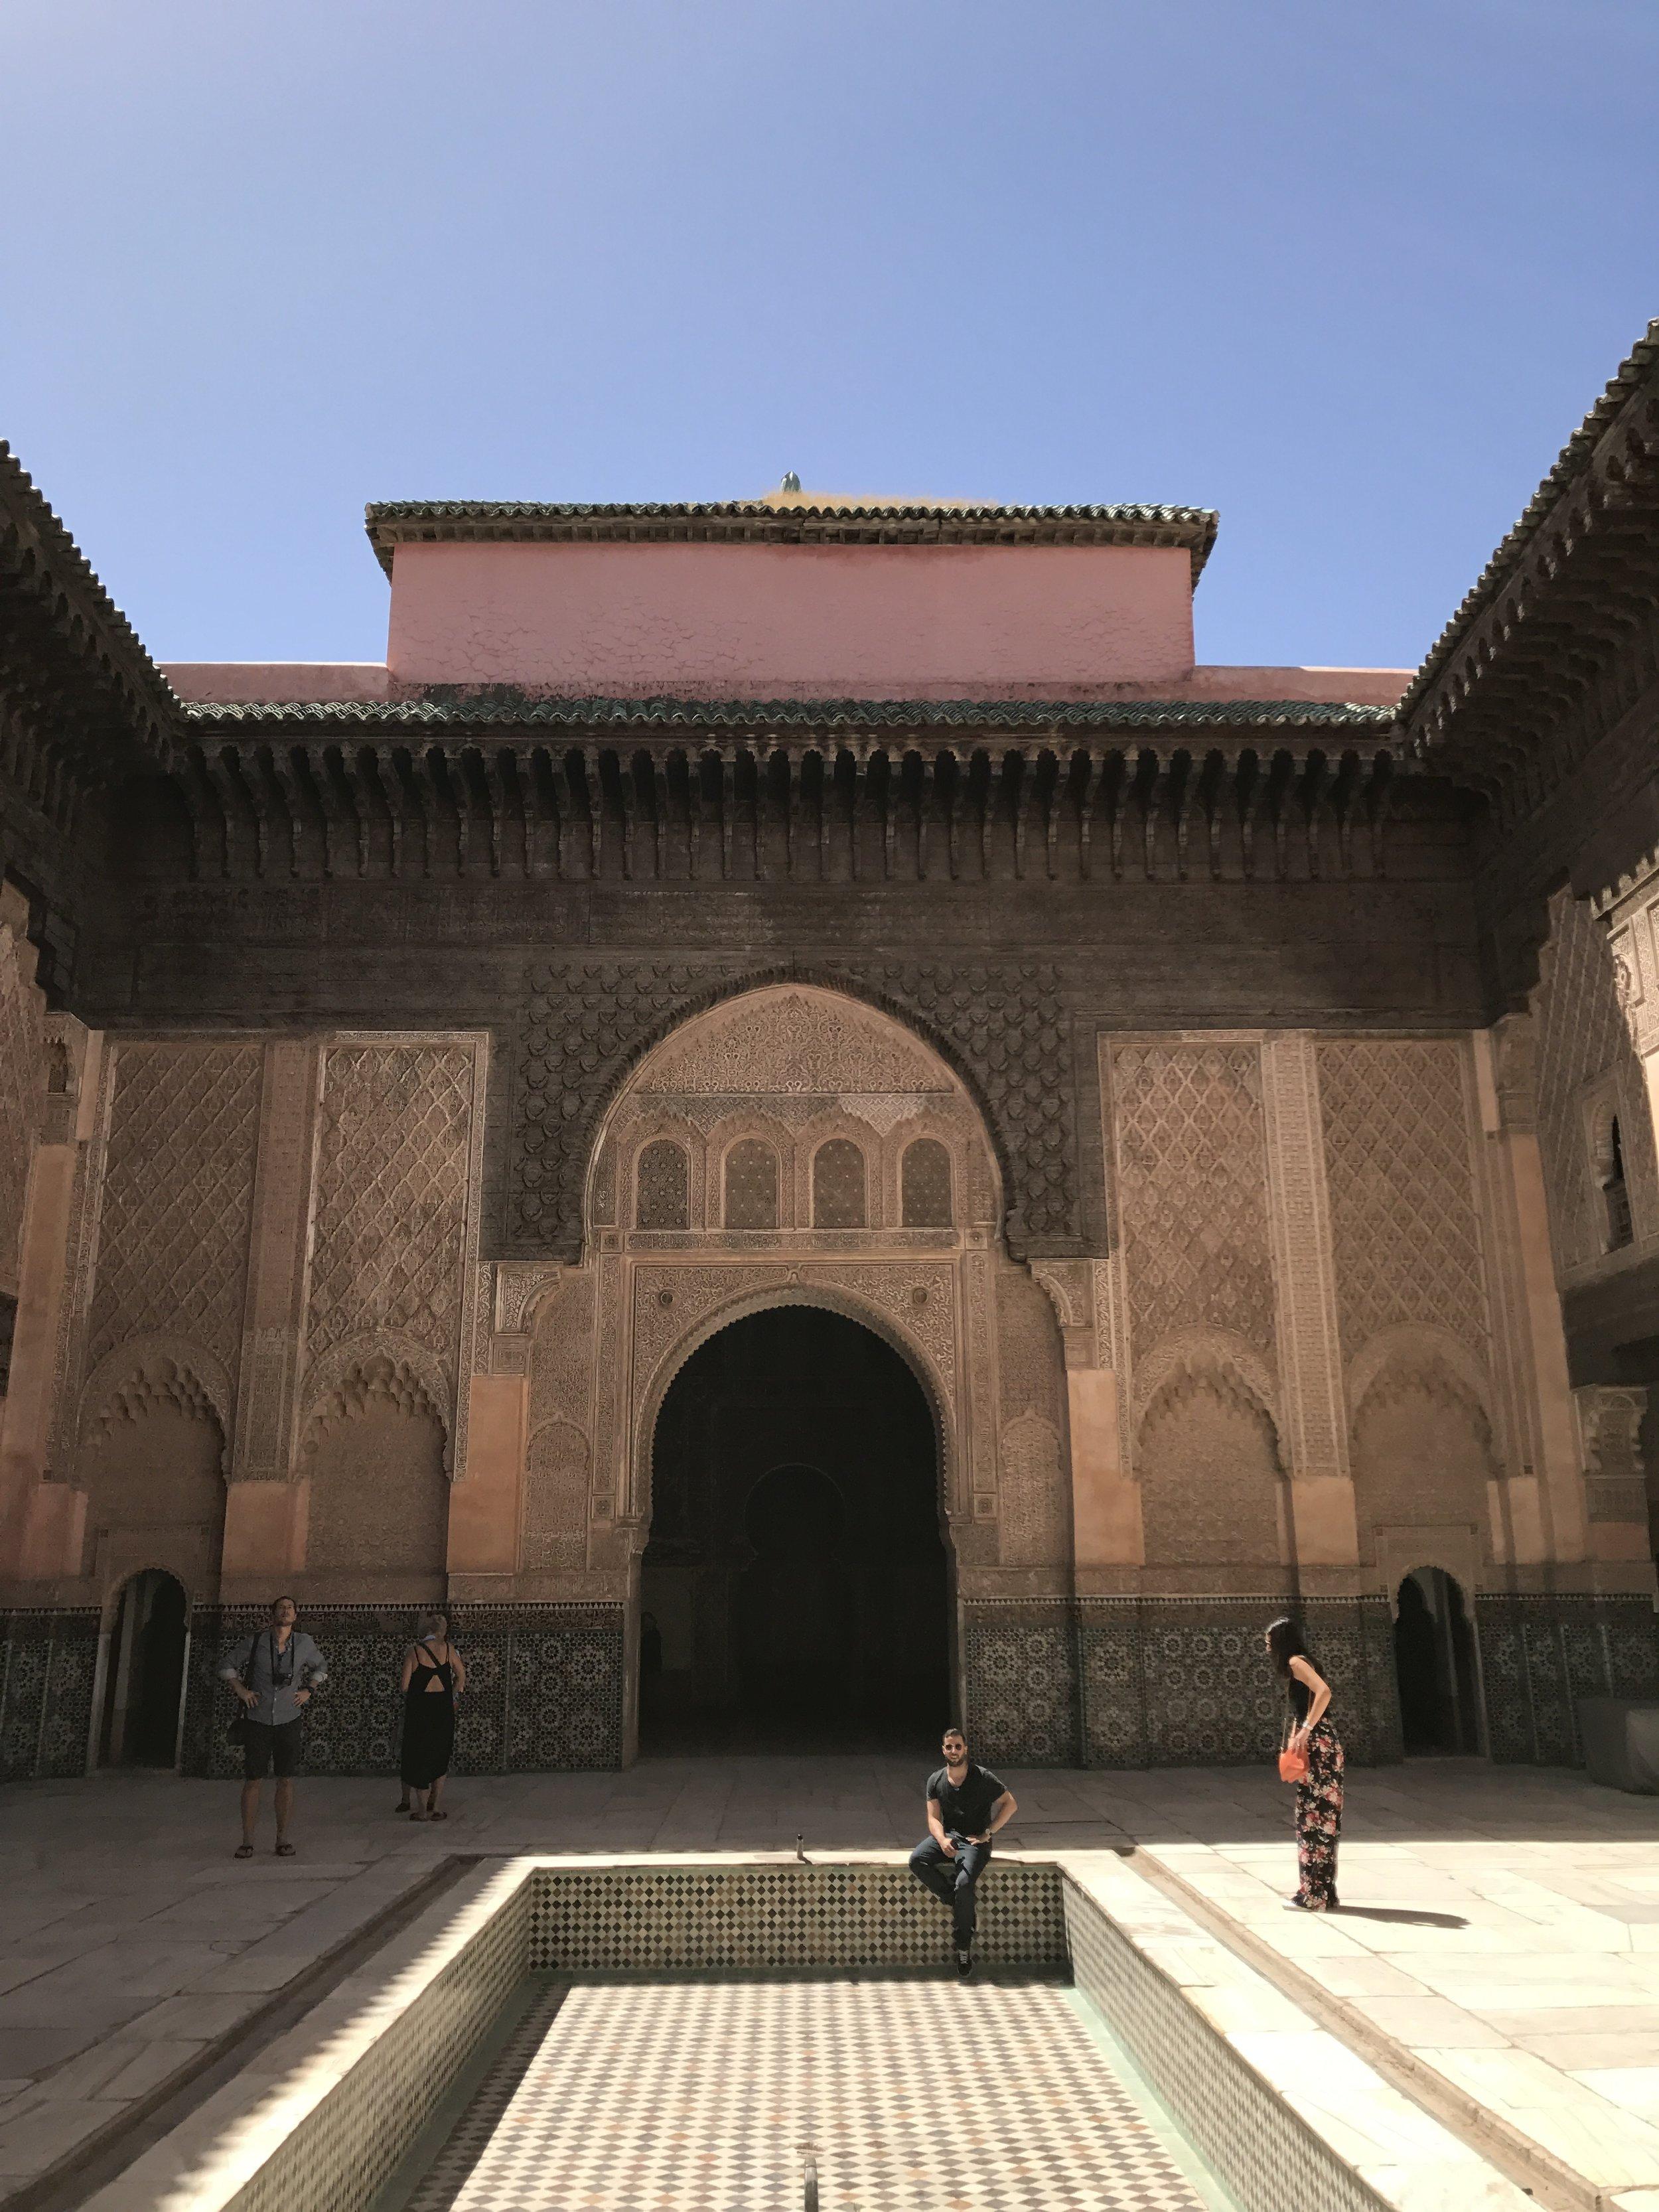 Interior courtyard of the Ben Youssef Mosque built in 1070.